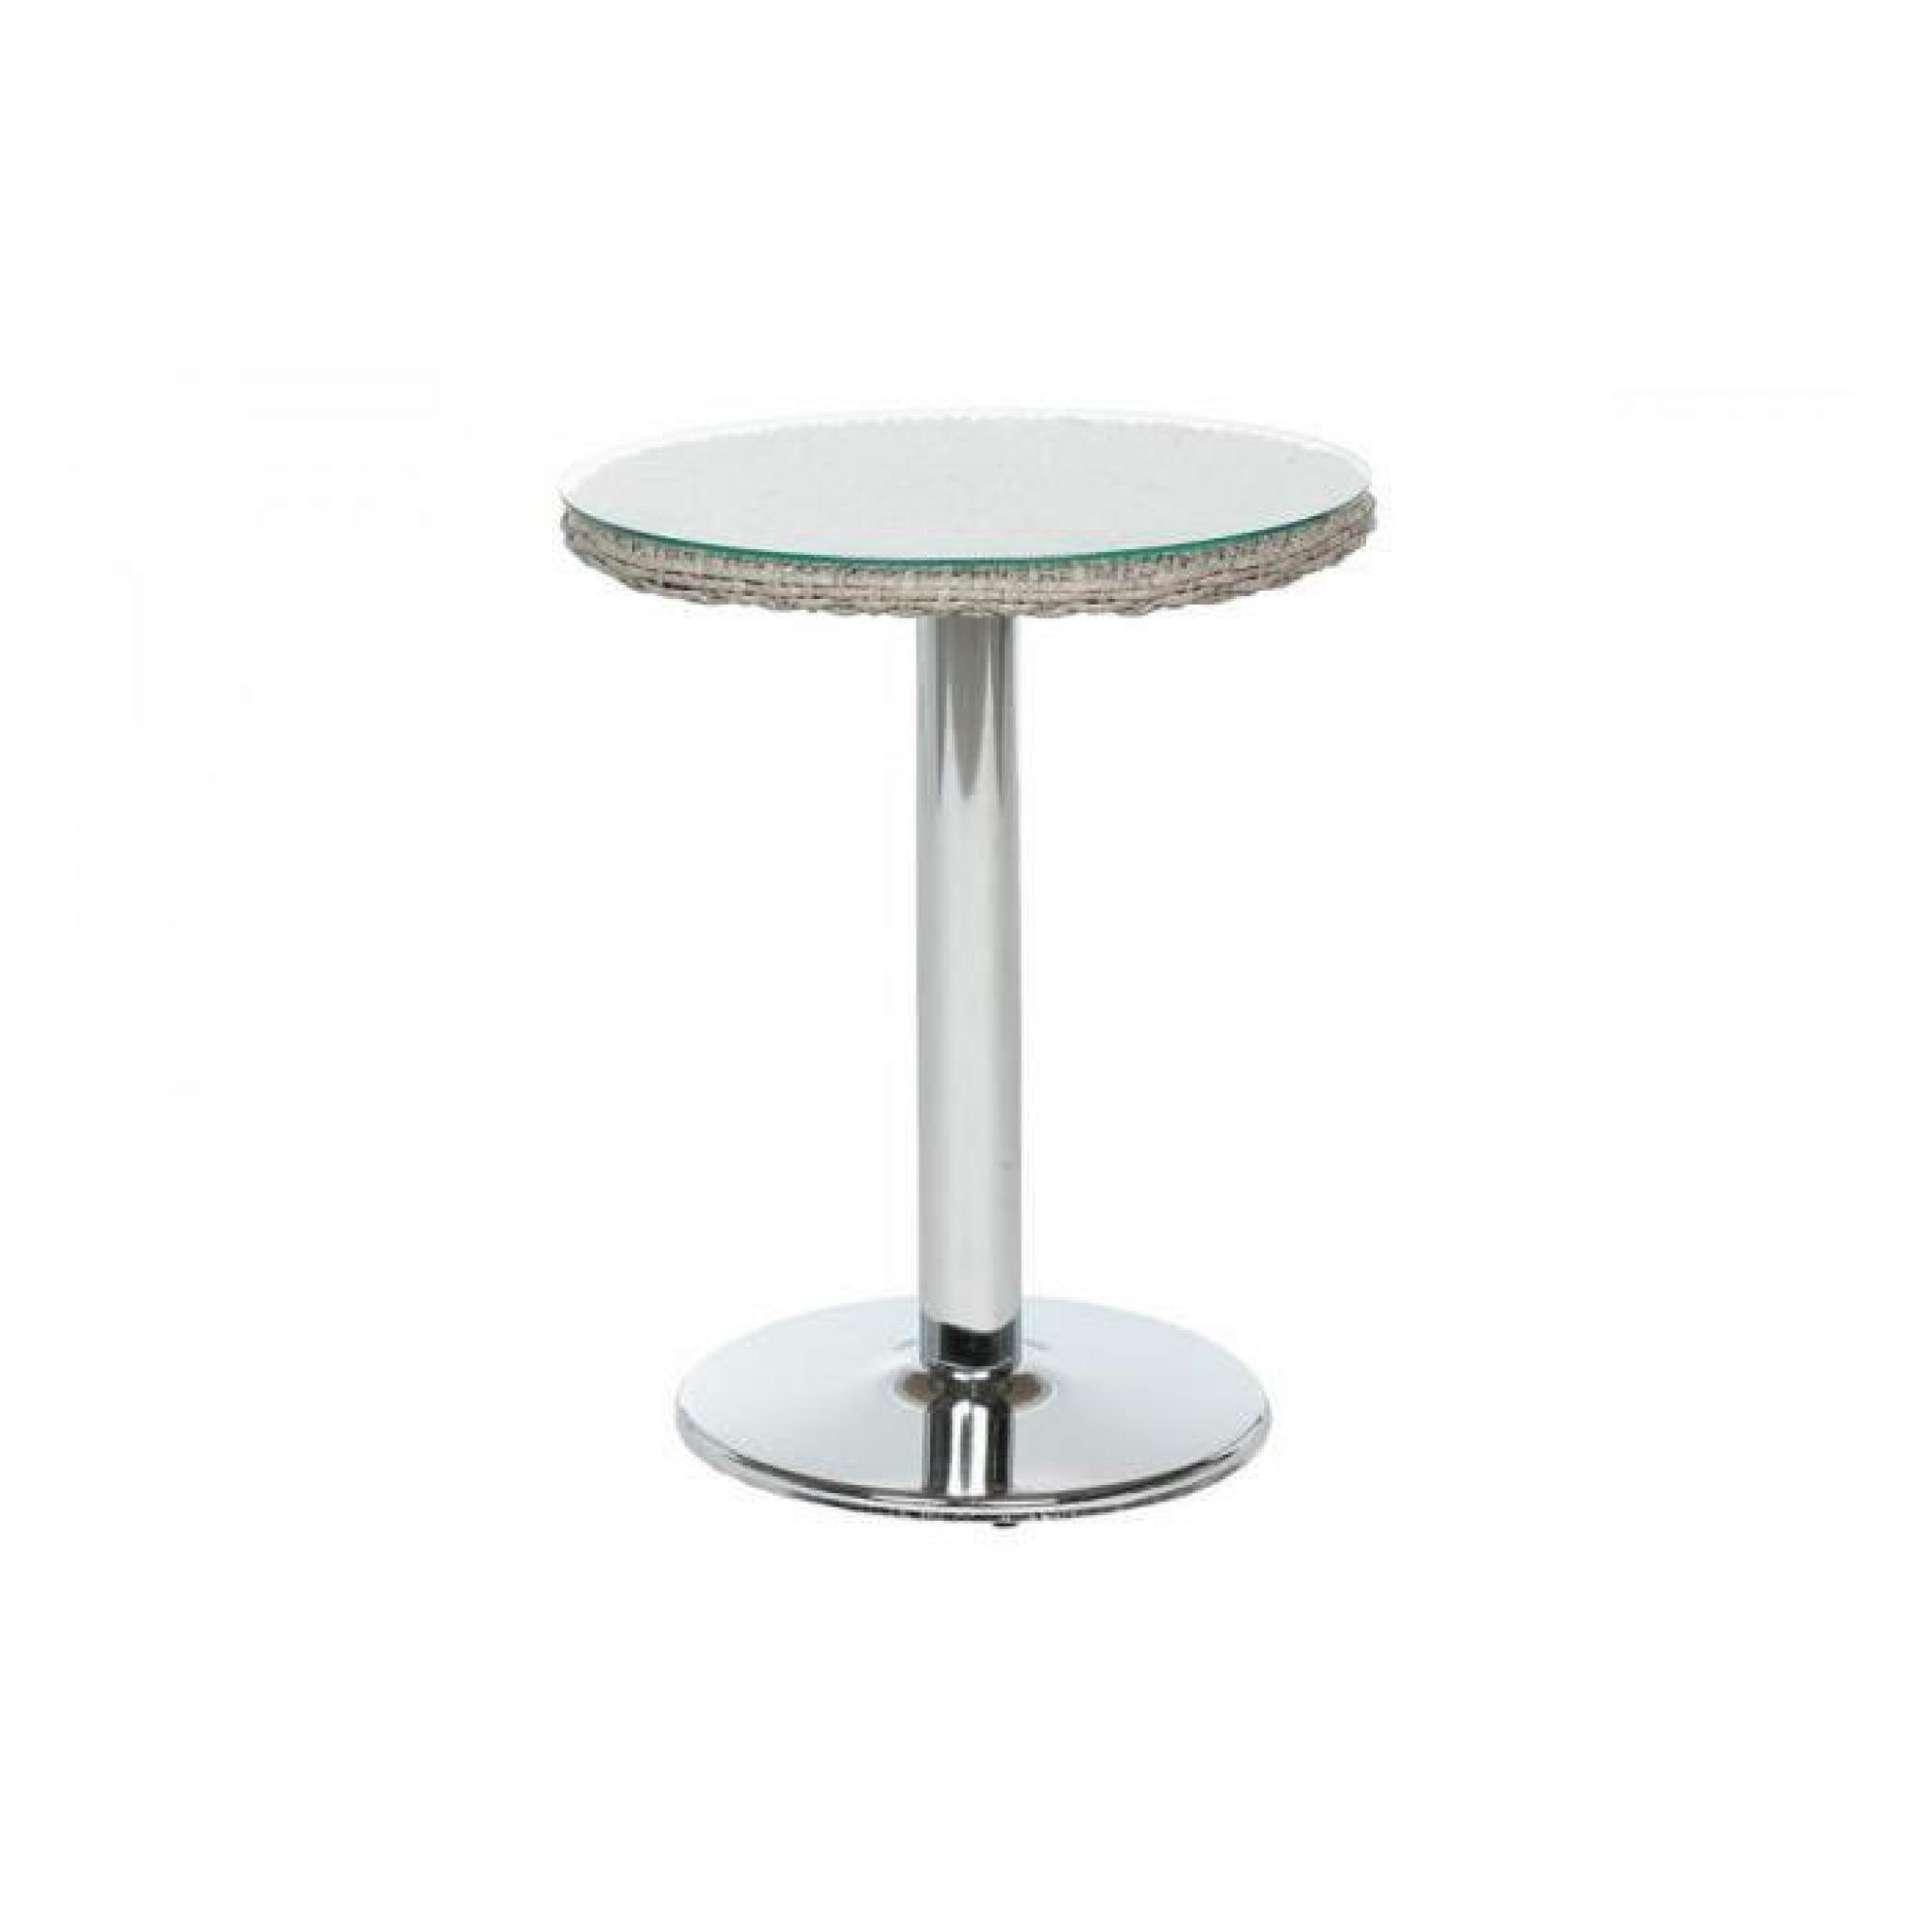 Table De Jardin Ronde Hesperide | Table Ronde De Jardin En Aluminium ...